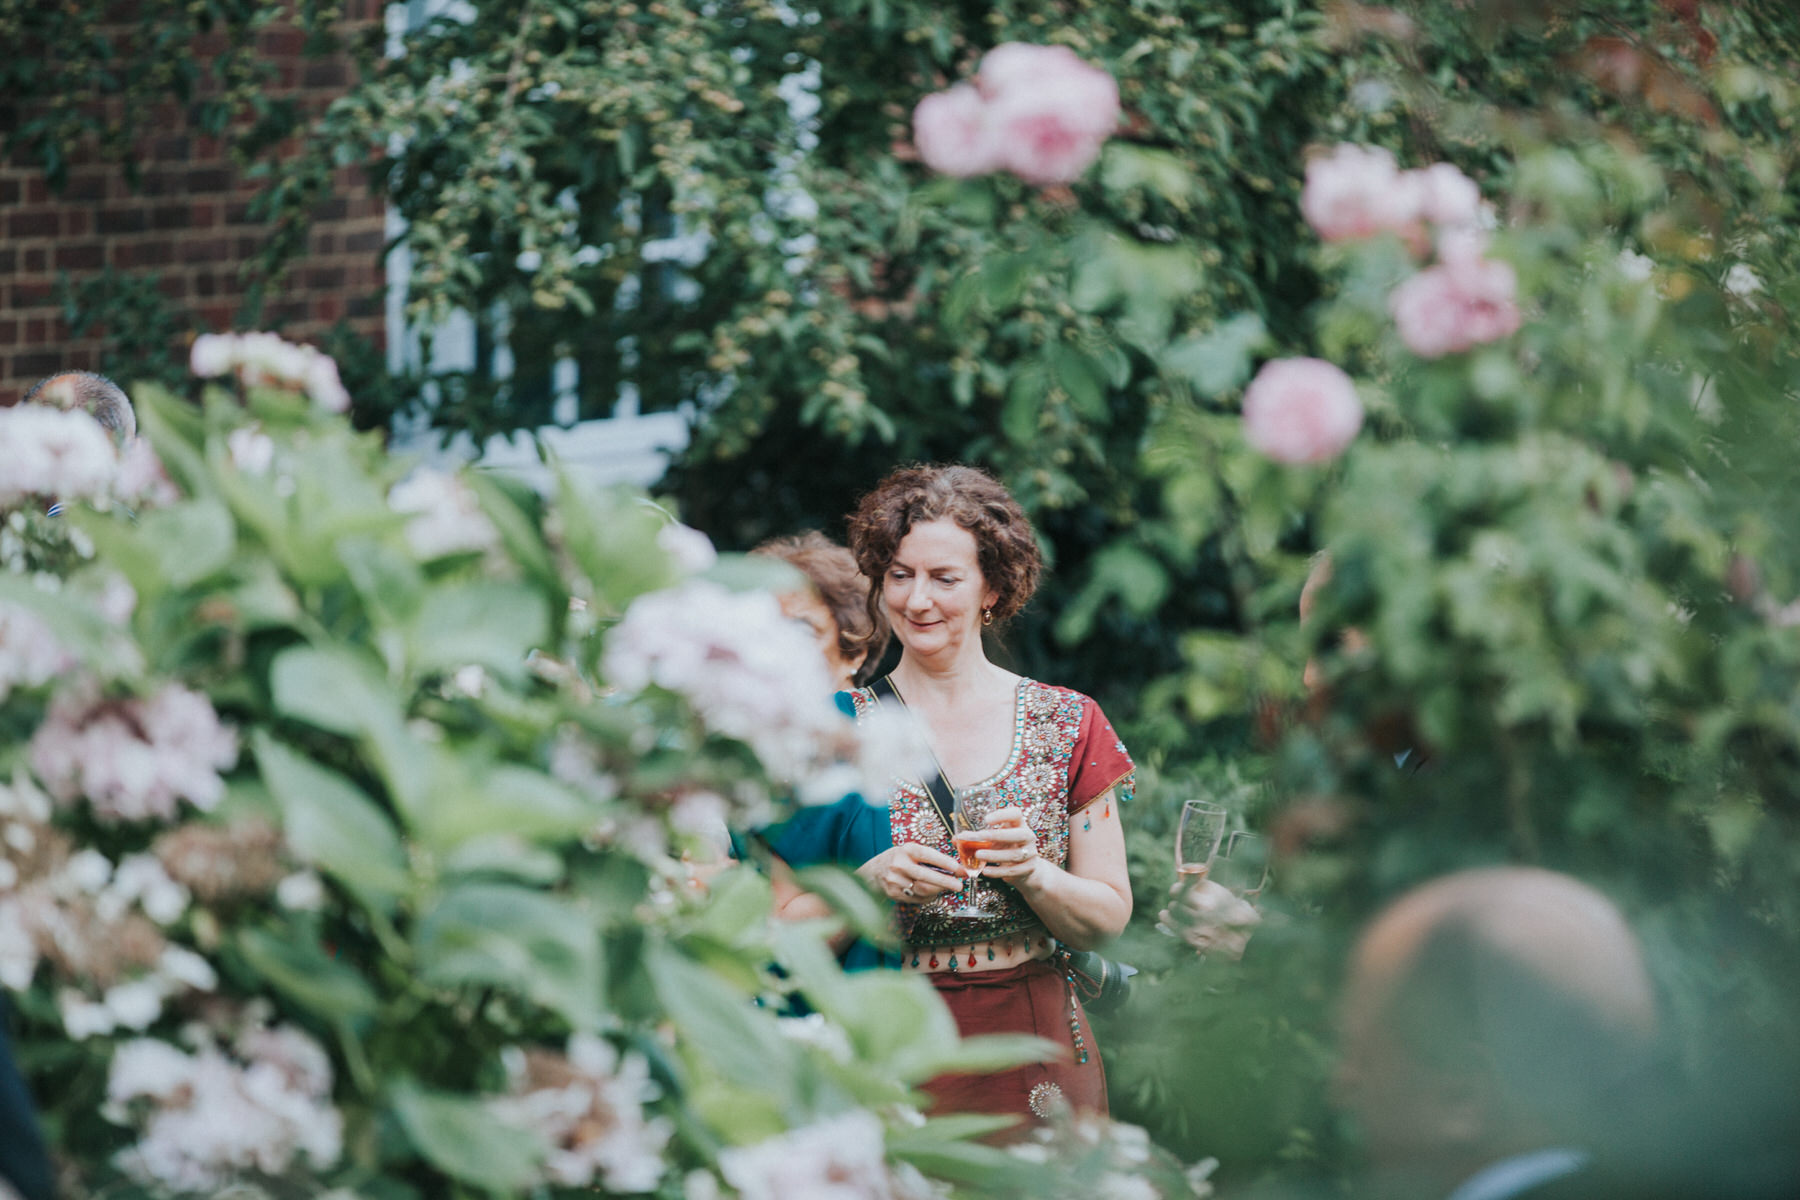 131-London-Wedding-guest-reportage-rose-bushes.jpg